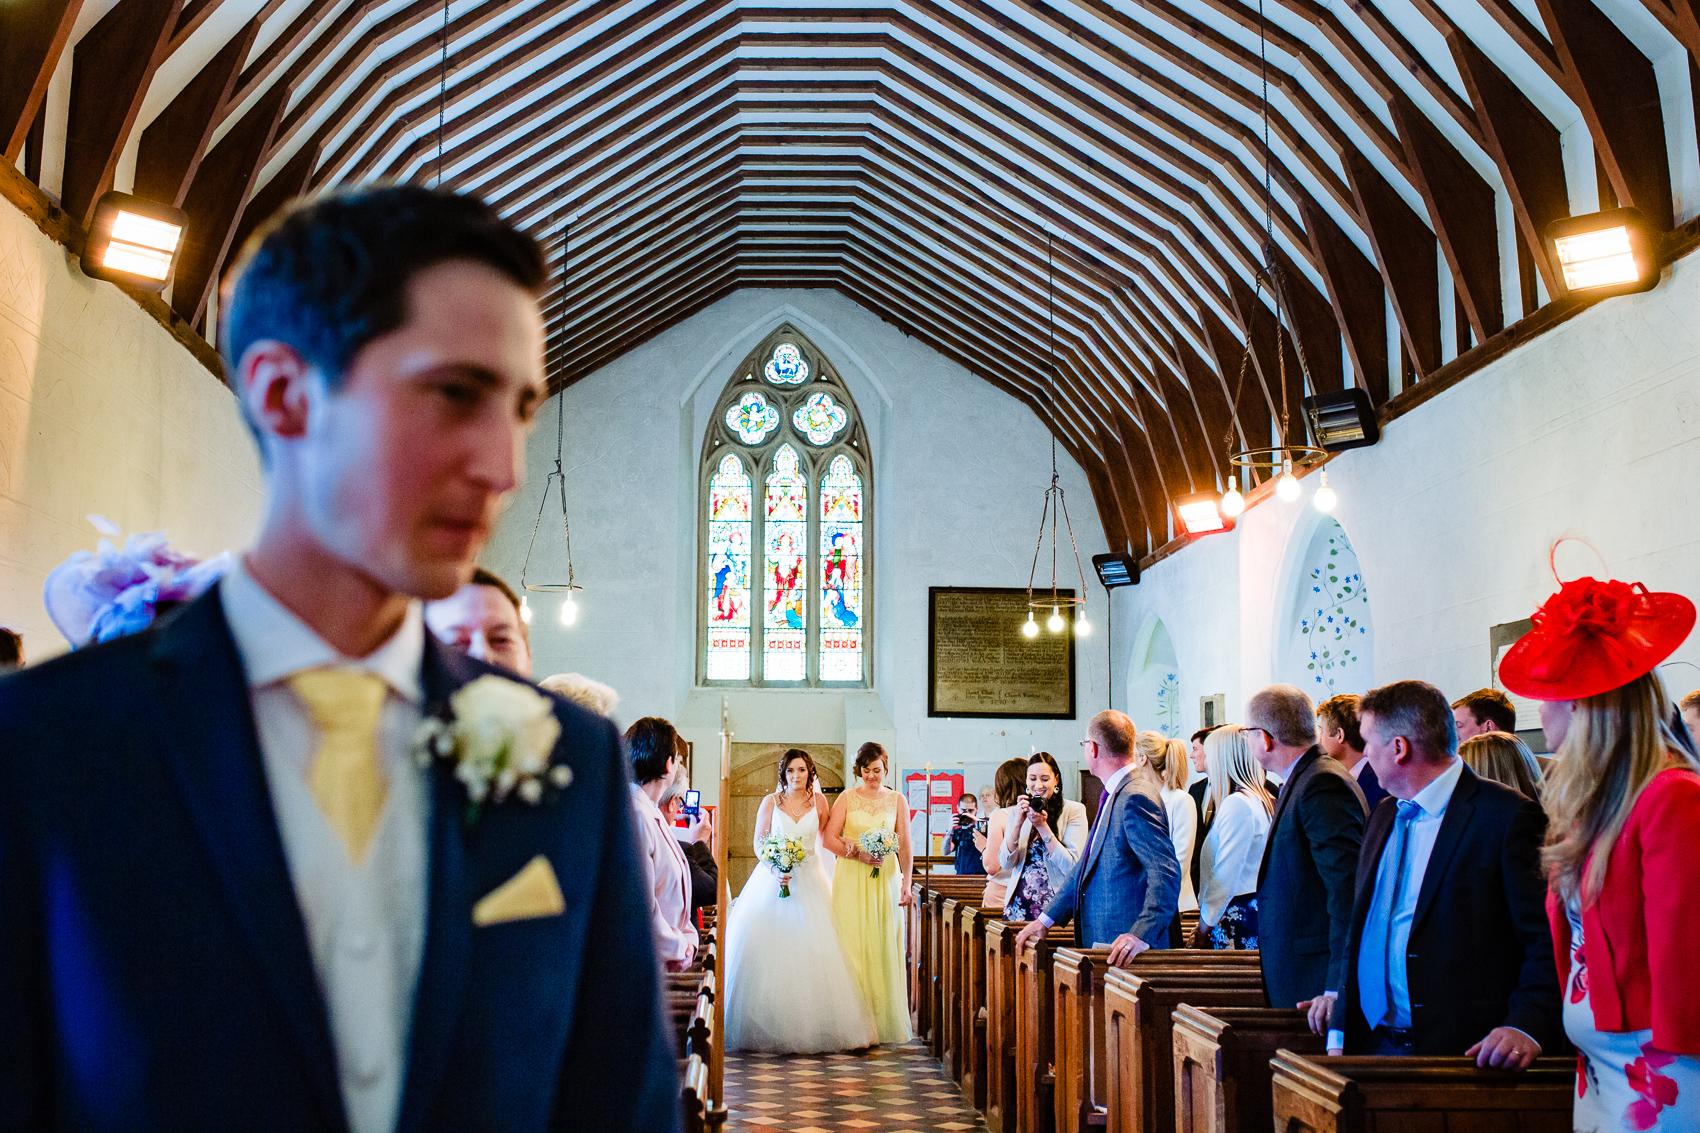 Bride wlaking down the aisle at St Leonard's Church Sherfield on Loddon